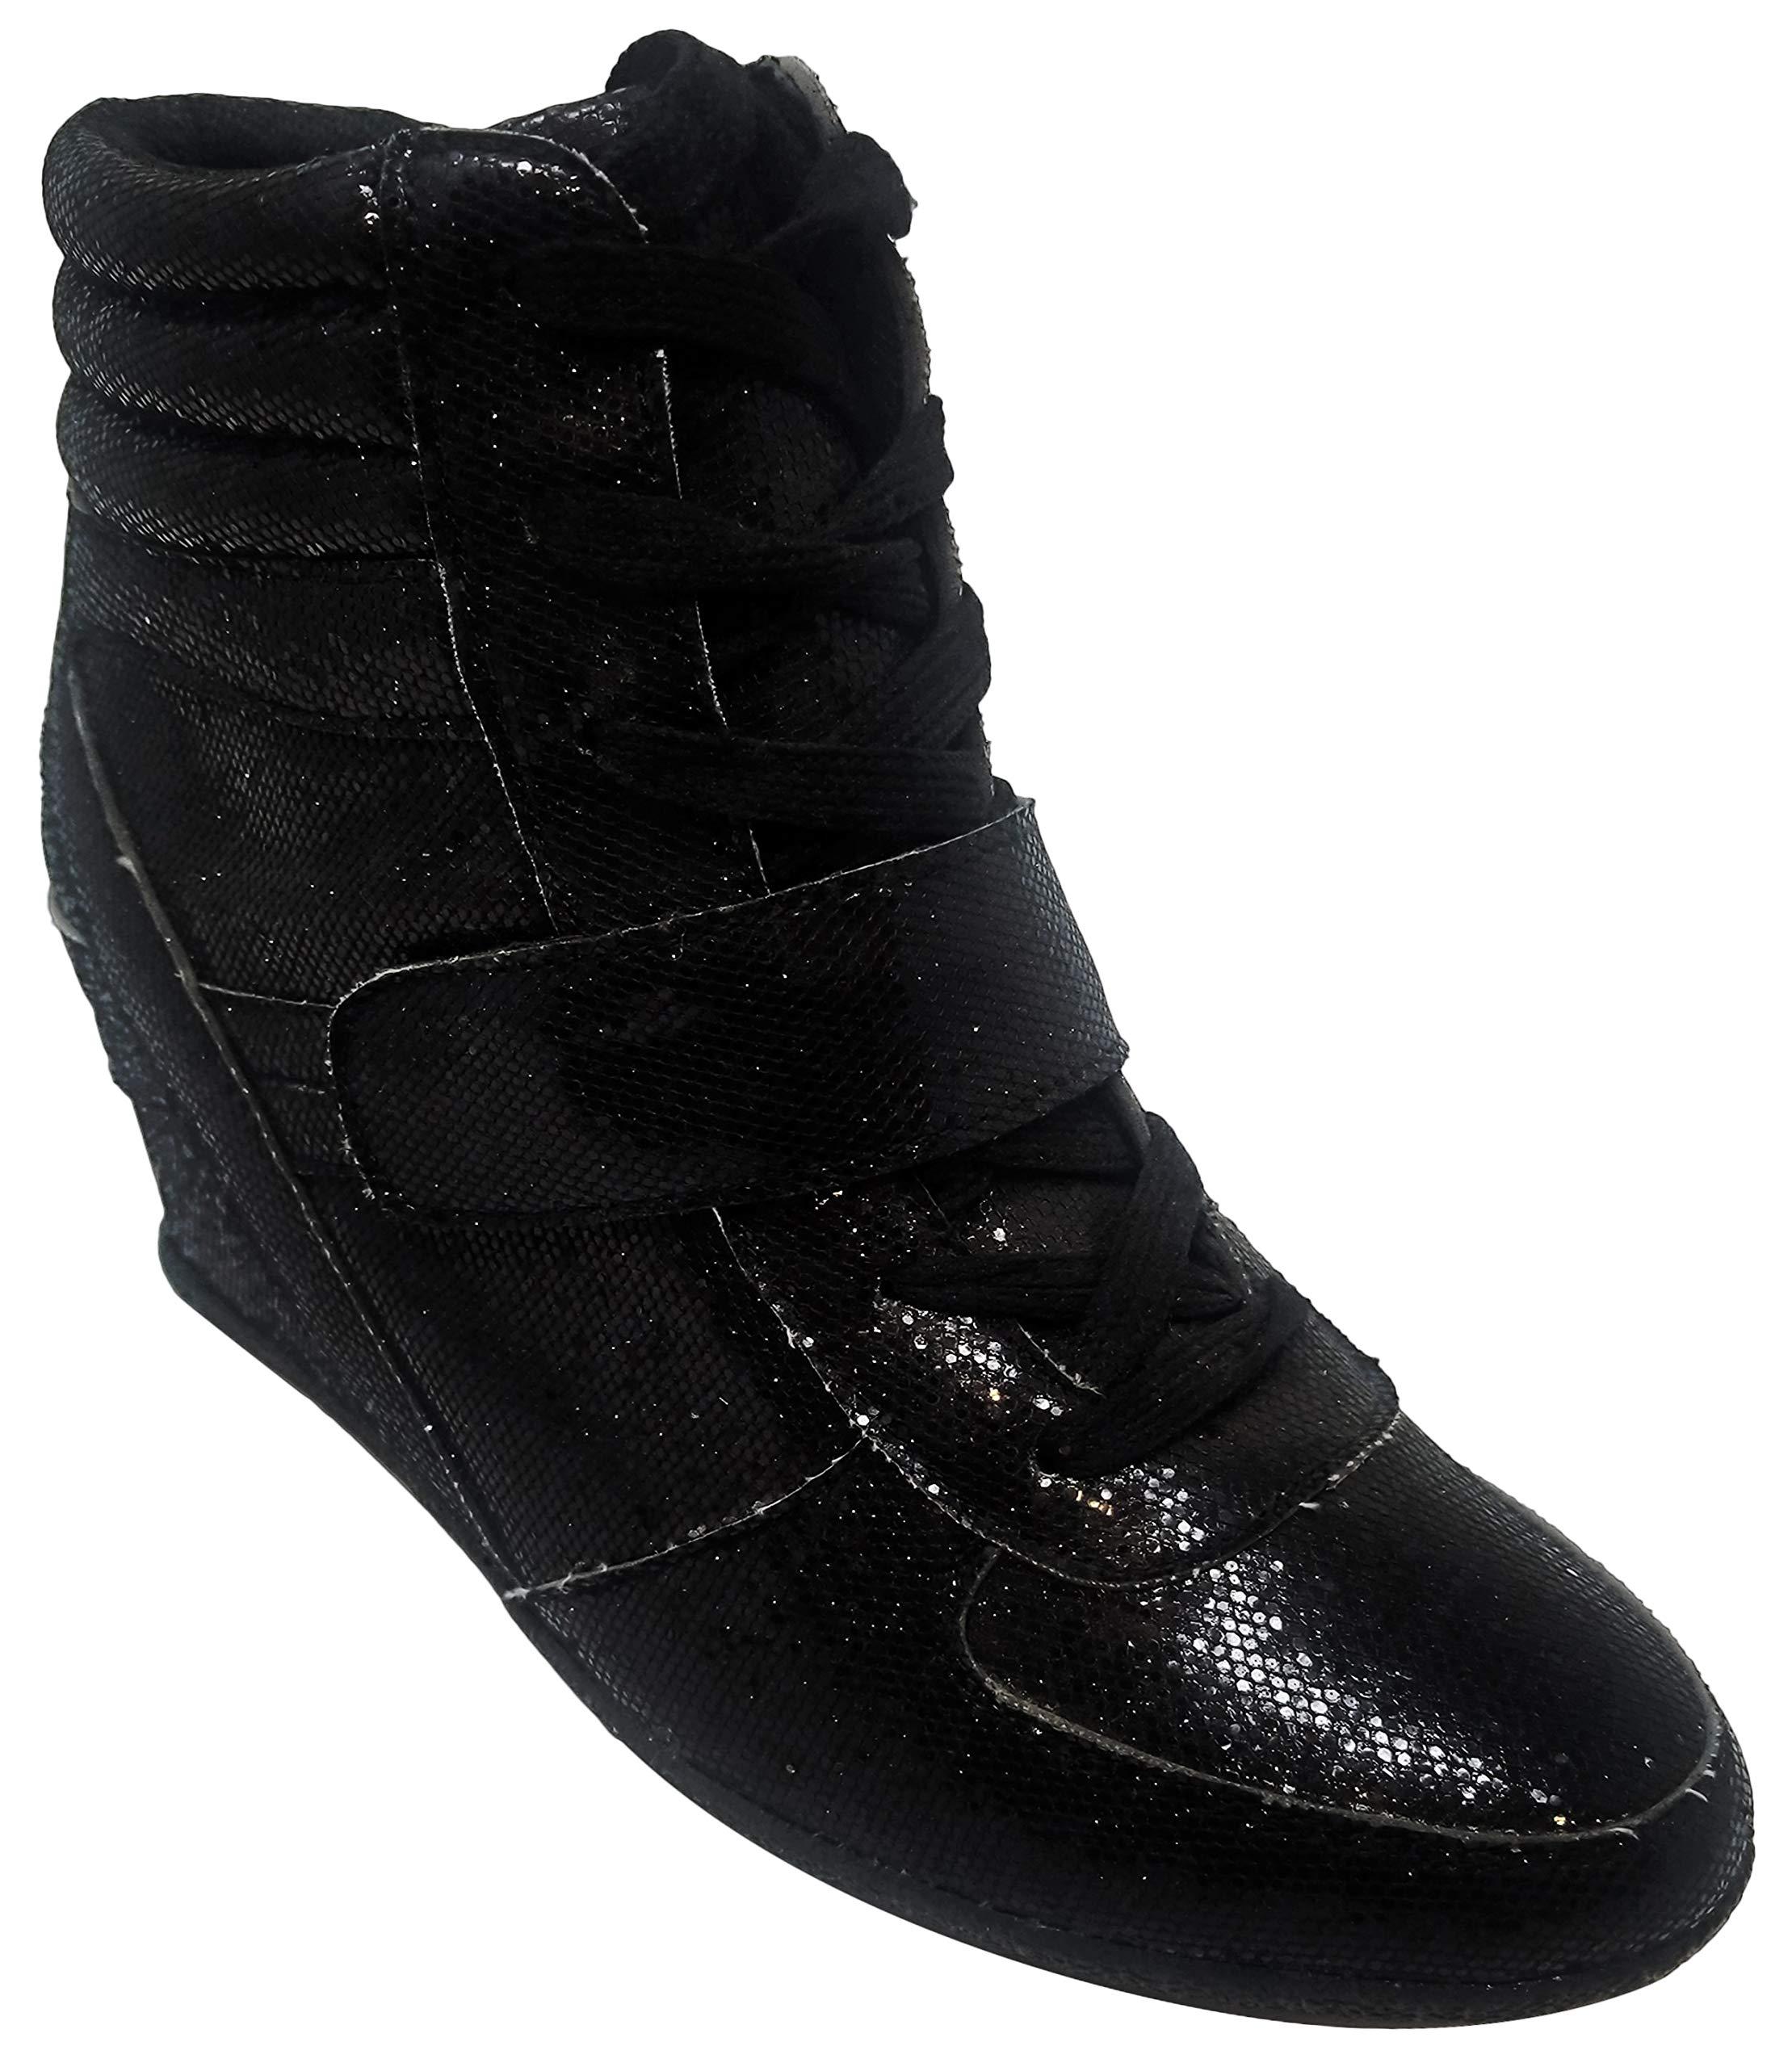 5a63d8cf129a ... Wedge High Top Fashion Sneaker Laceup Platform Wedge Heeled Fun Cute  Trendy Flashy Studded Fun Slip On Bootie Shoe for Women Teen Girl (Size 7